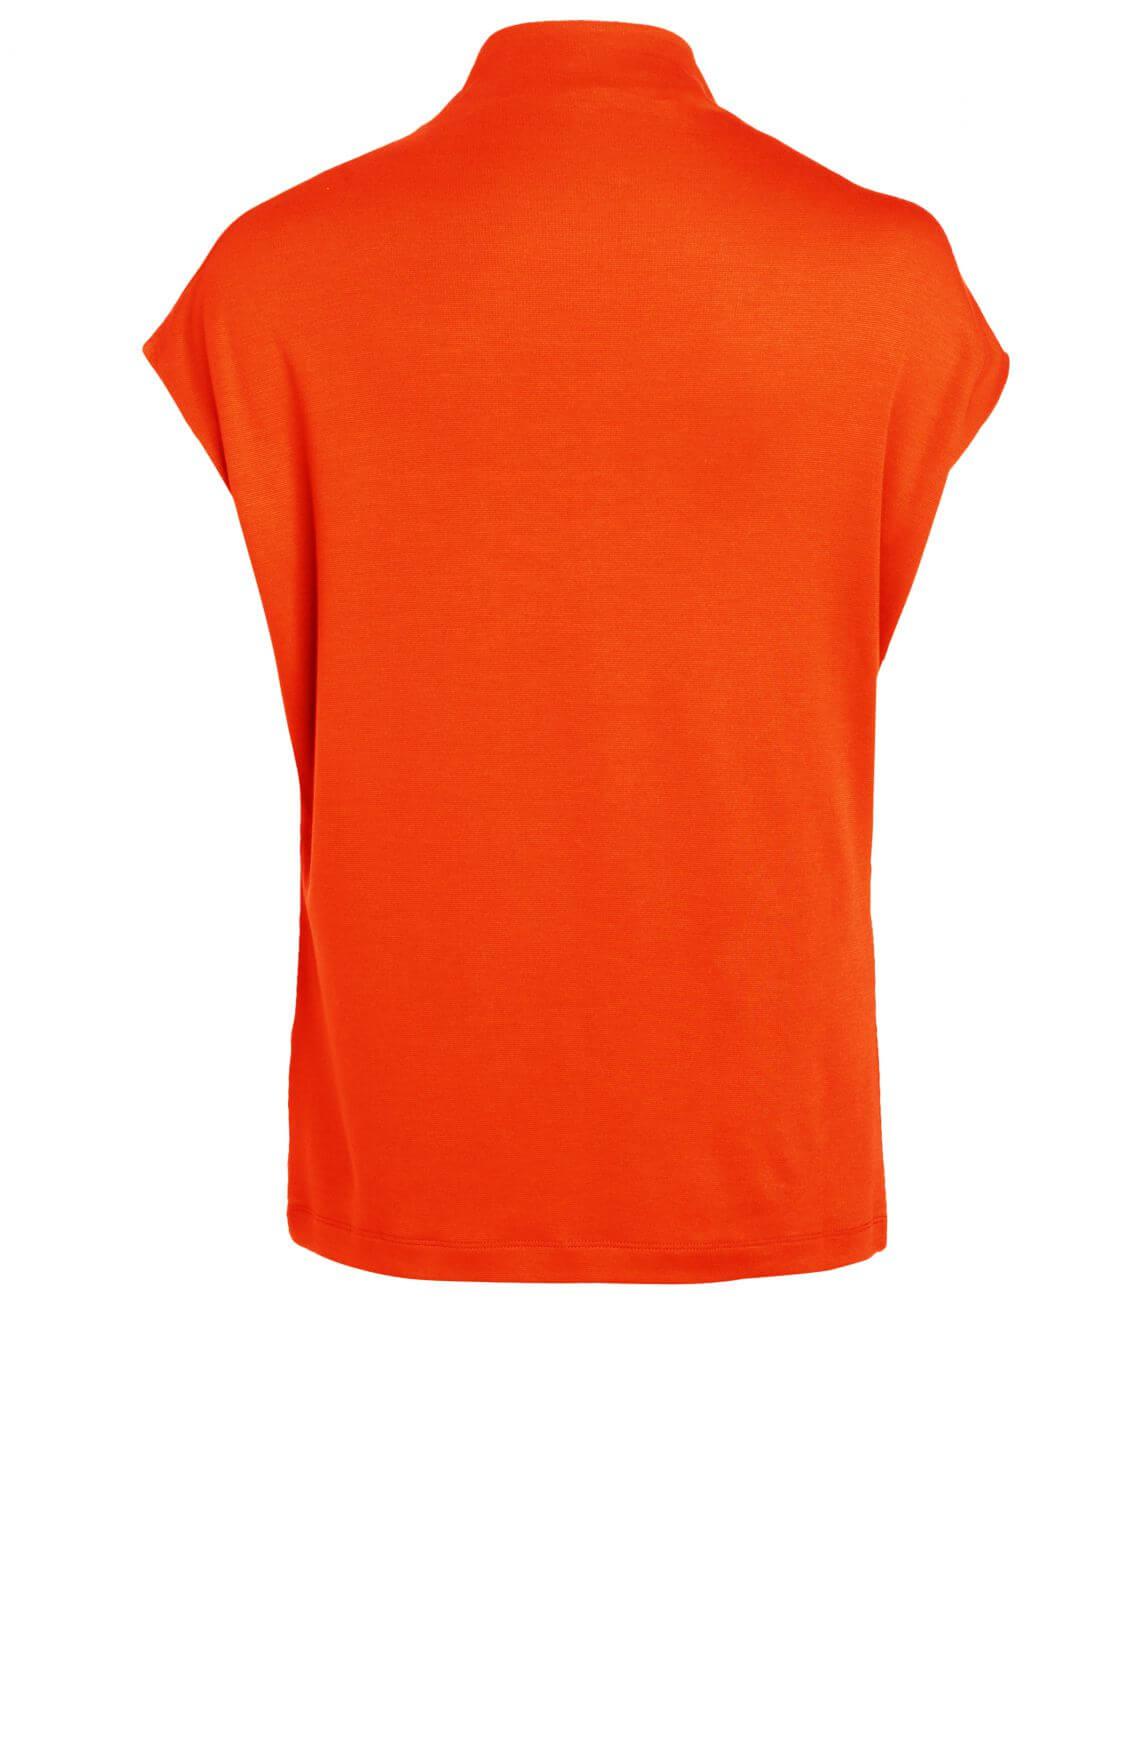 Anna Dames Shirt met col Oranje